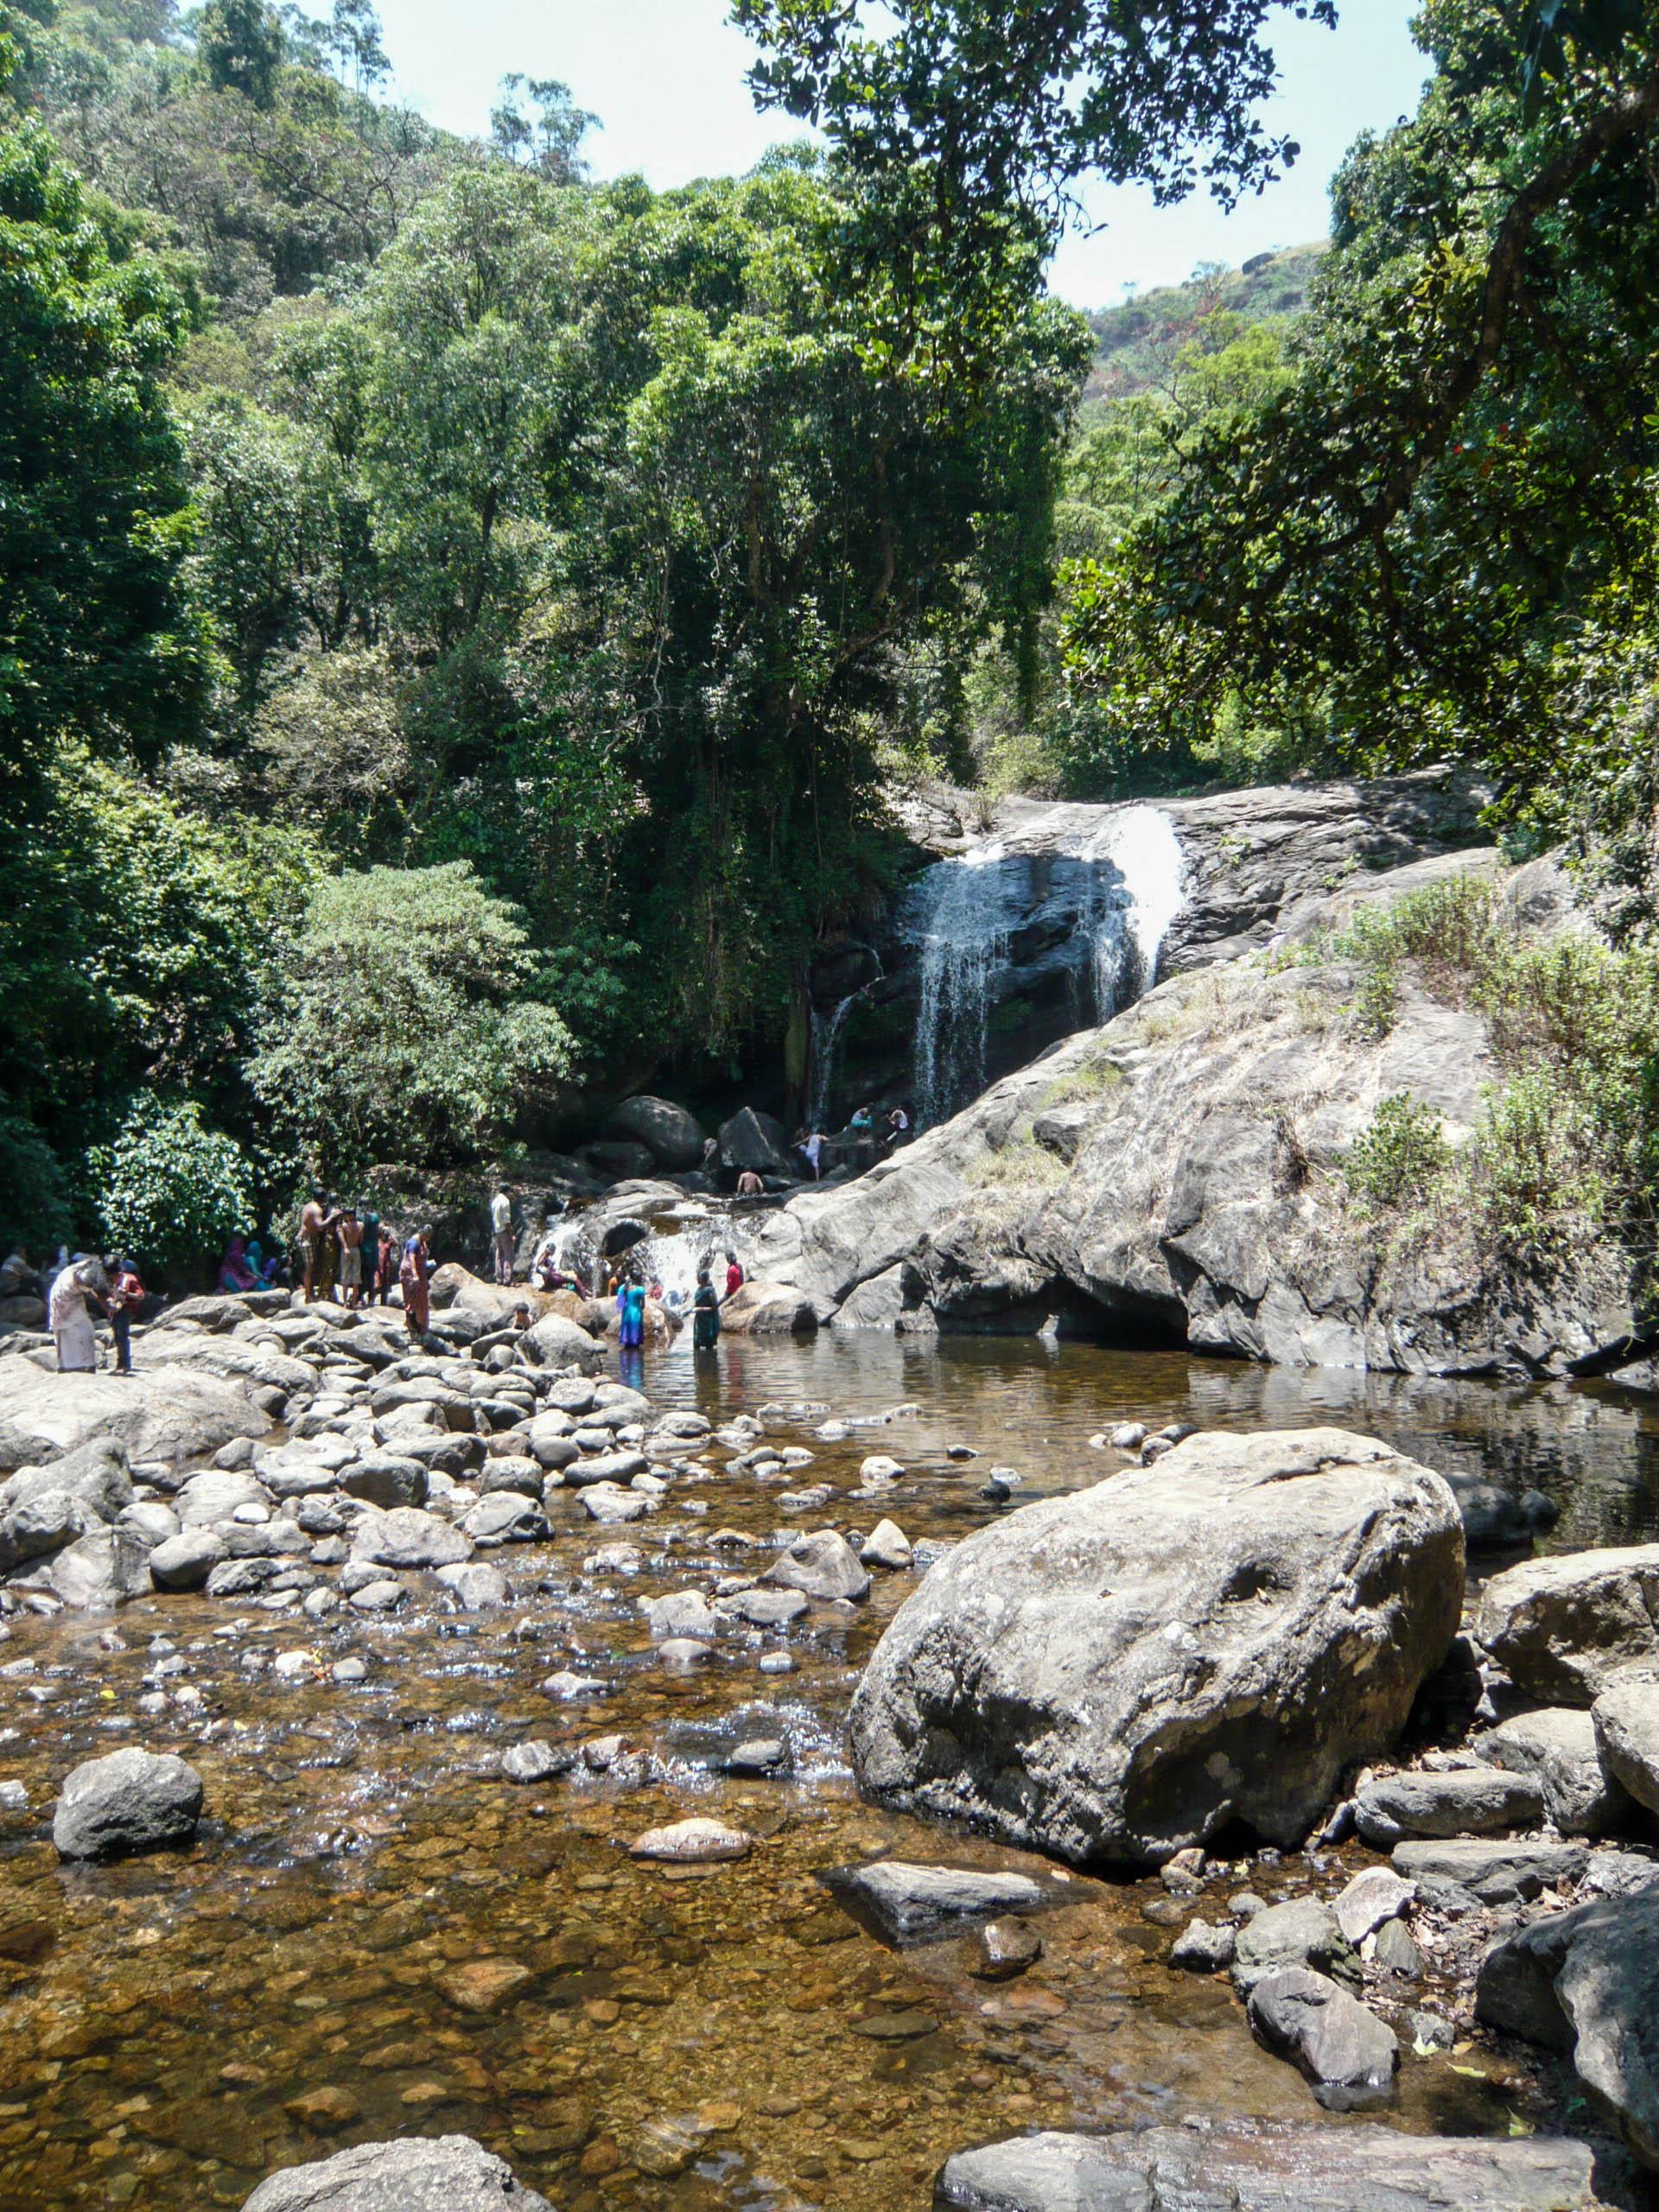 Lakkam Waterfalls, Munnar